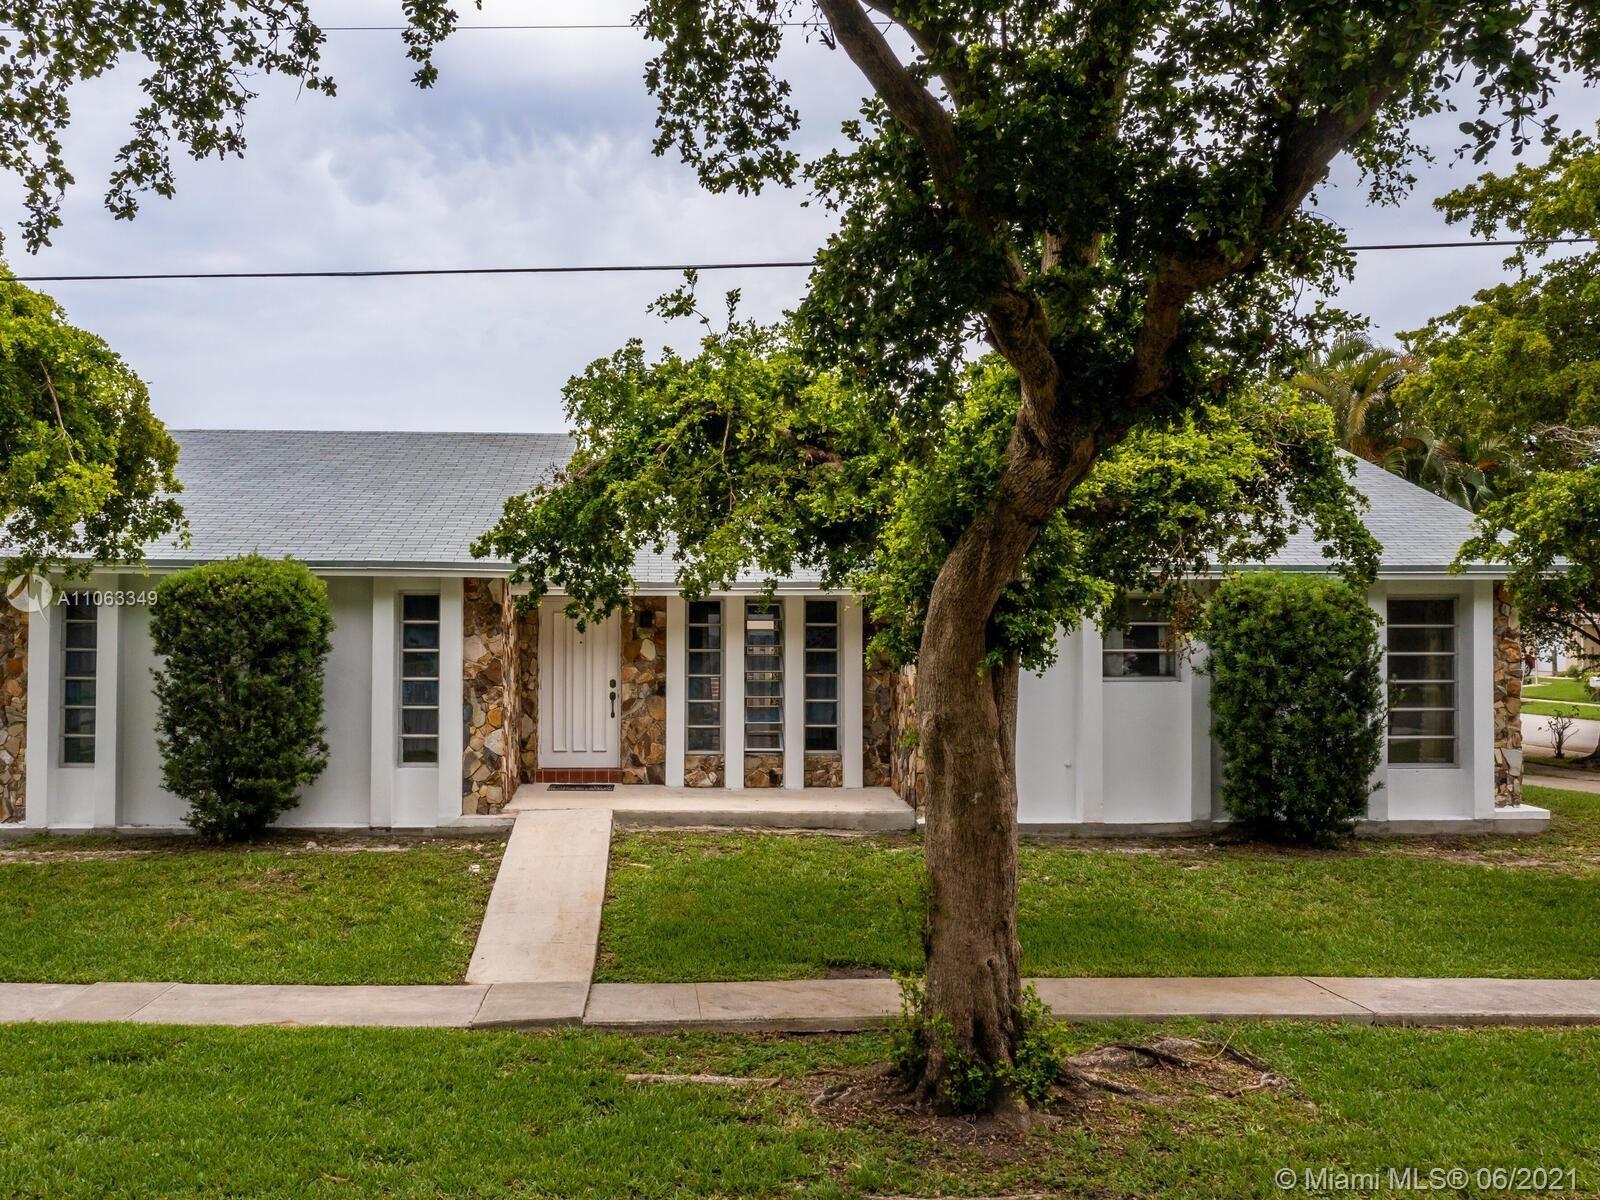 Photo of 301 SE 5th St, Dania Beach, FL 33004 (MLS # A11063349)